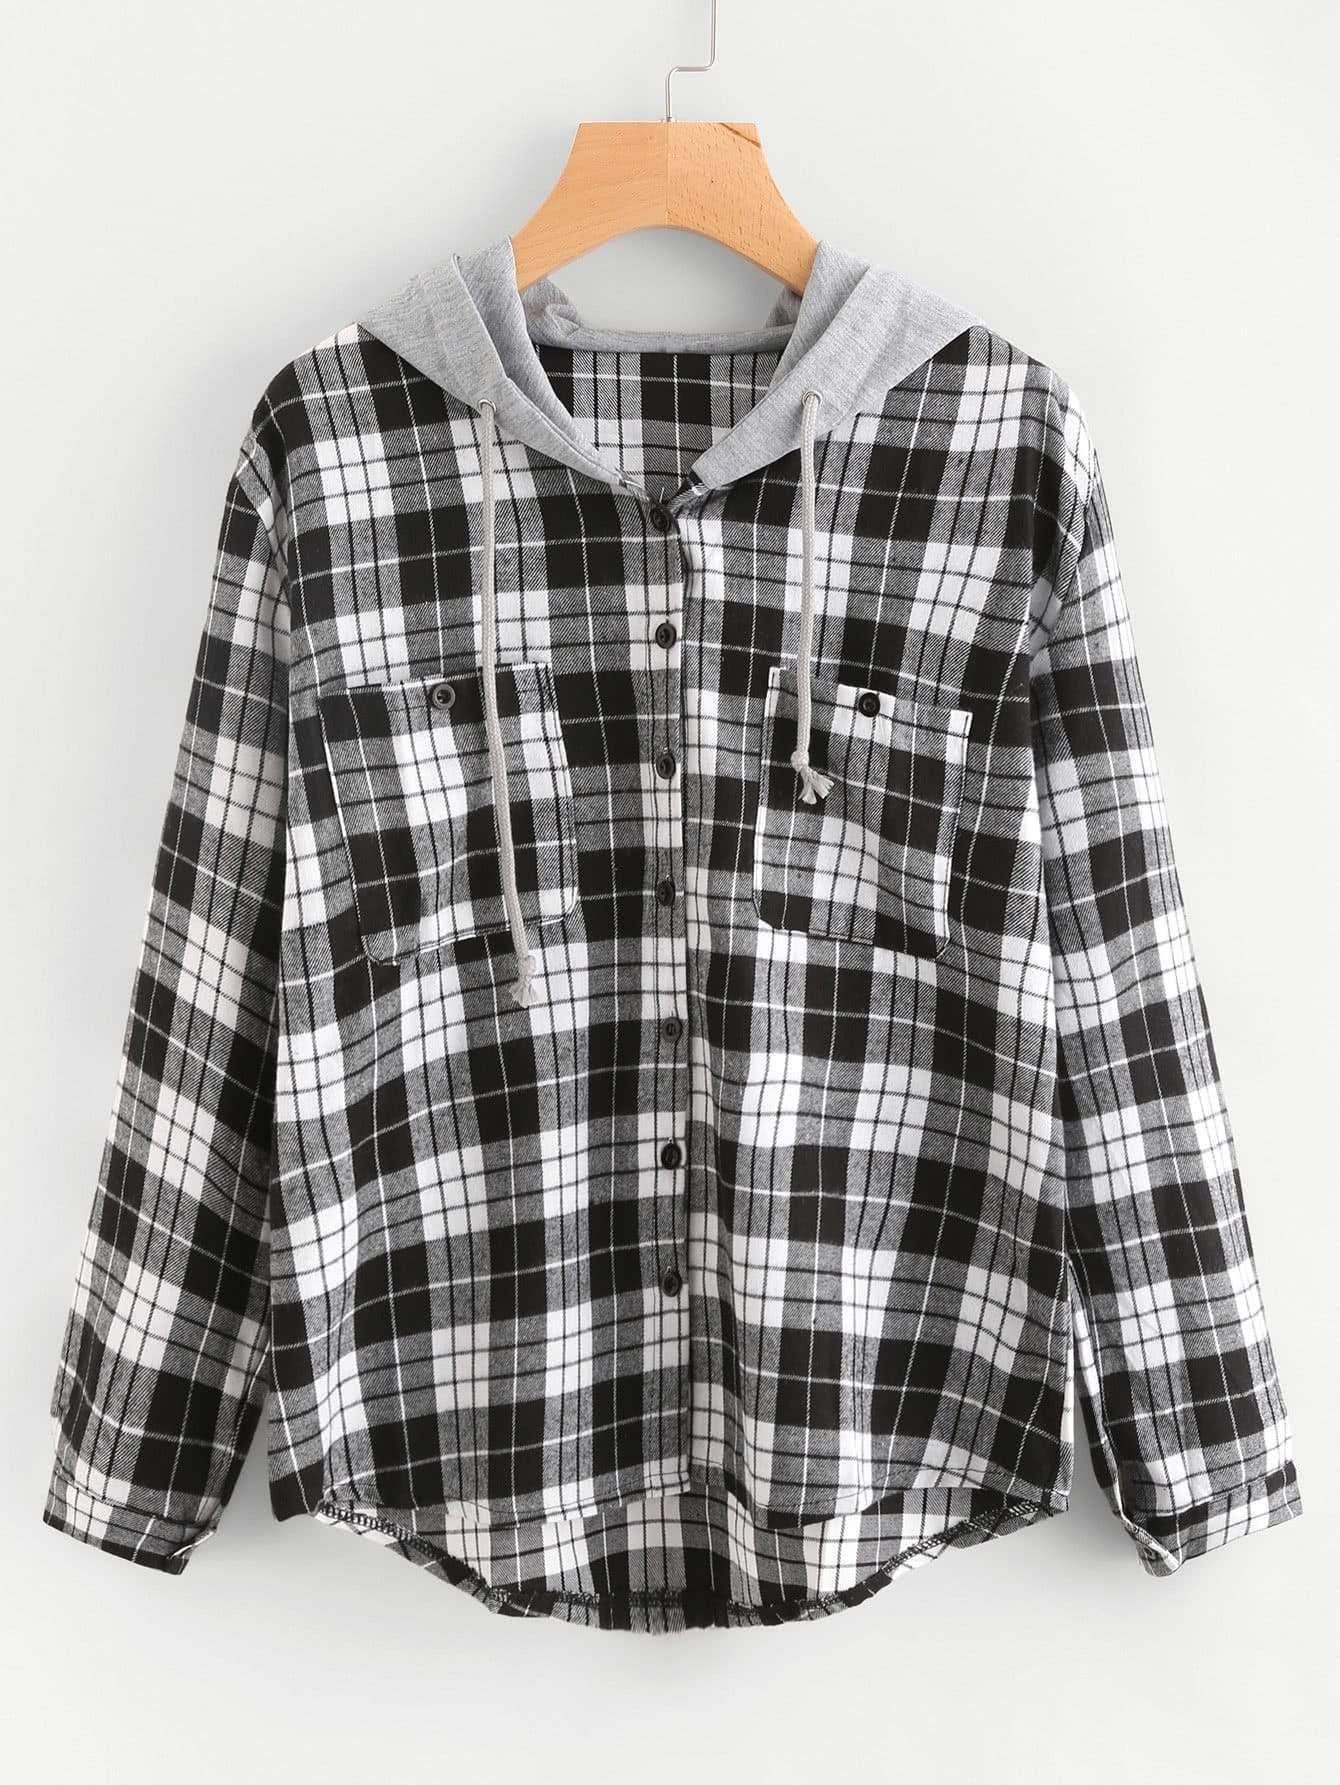 Plus Pocket Decoration Hooded Sweatshirt Hooded Sweatshirts Tartan Blouse Fashion [ 1785 x 1340 Pixel ]